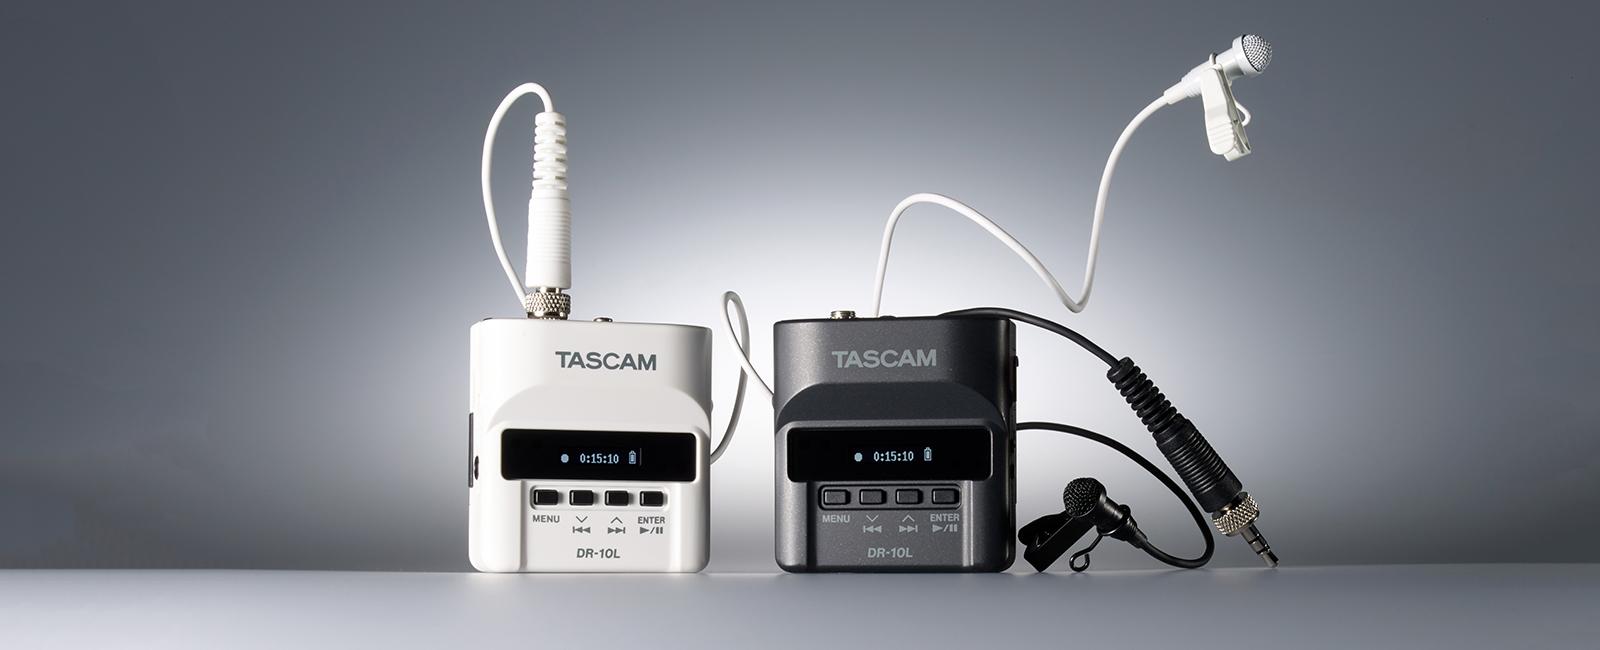 Tascam-DR-10L-Audio-Recorder-3.jpg